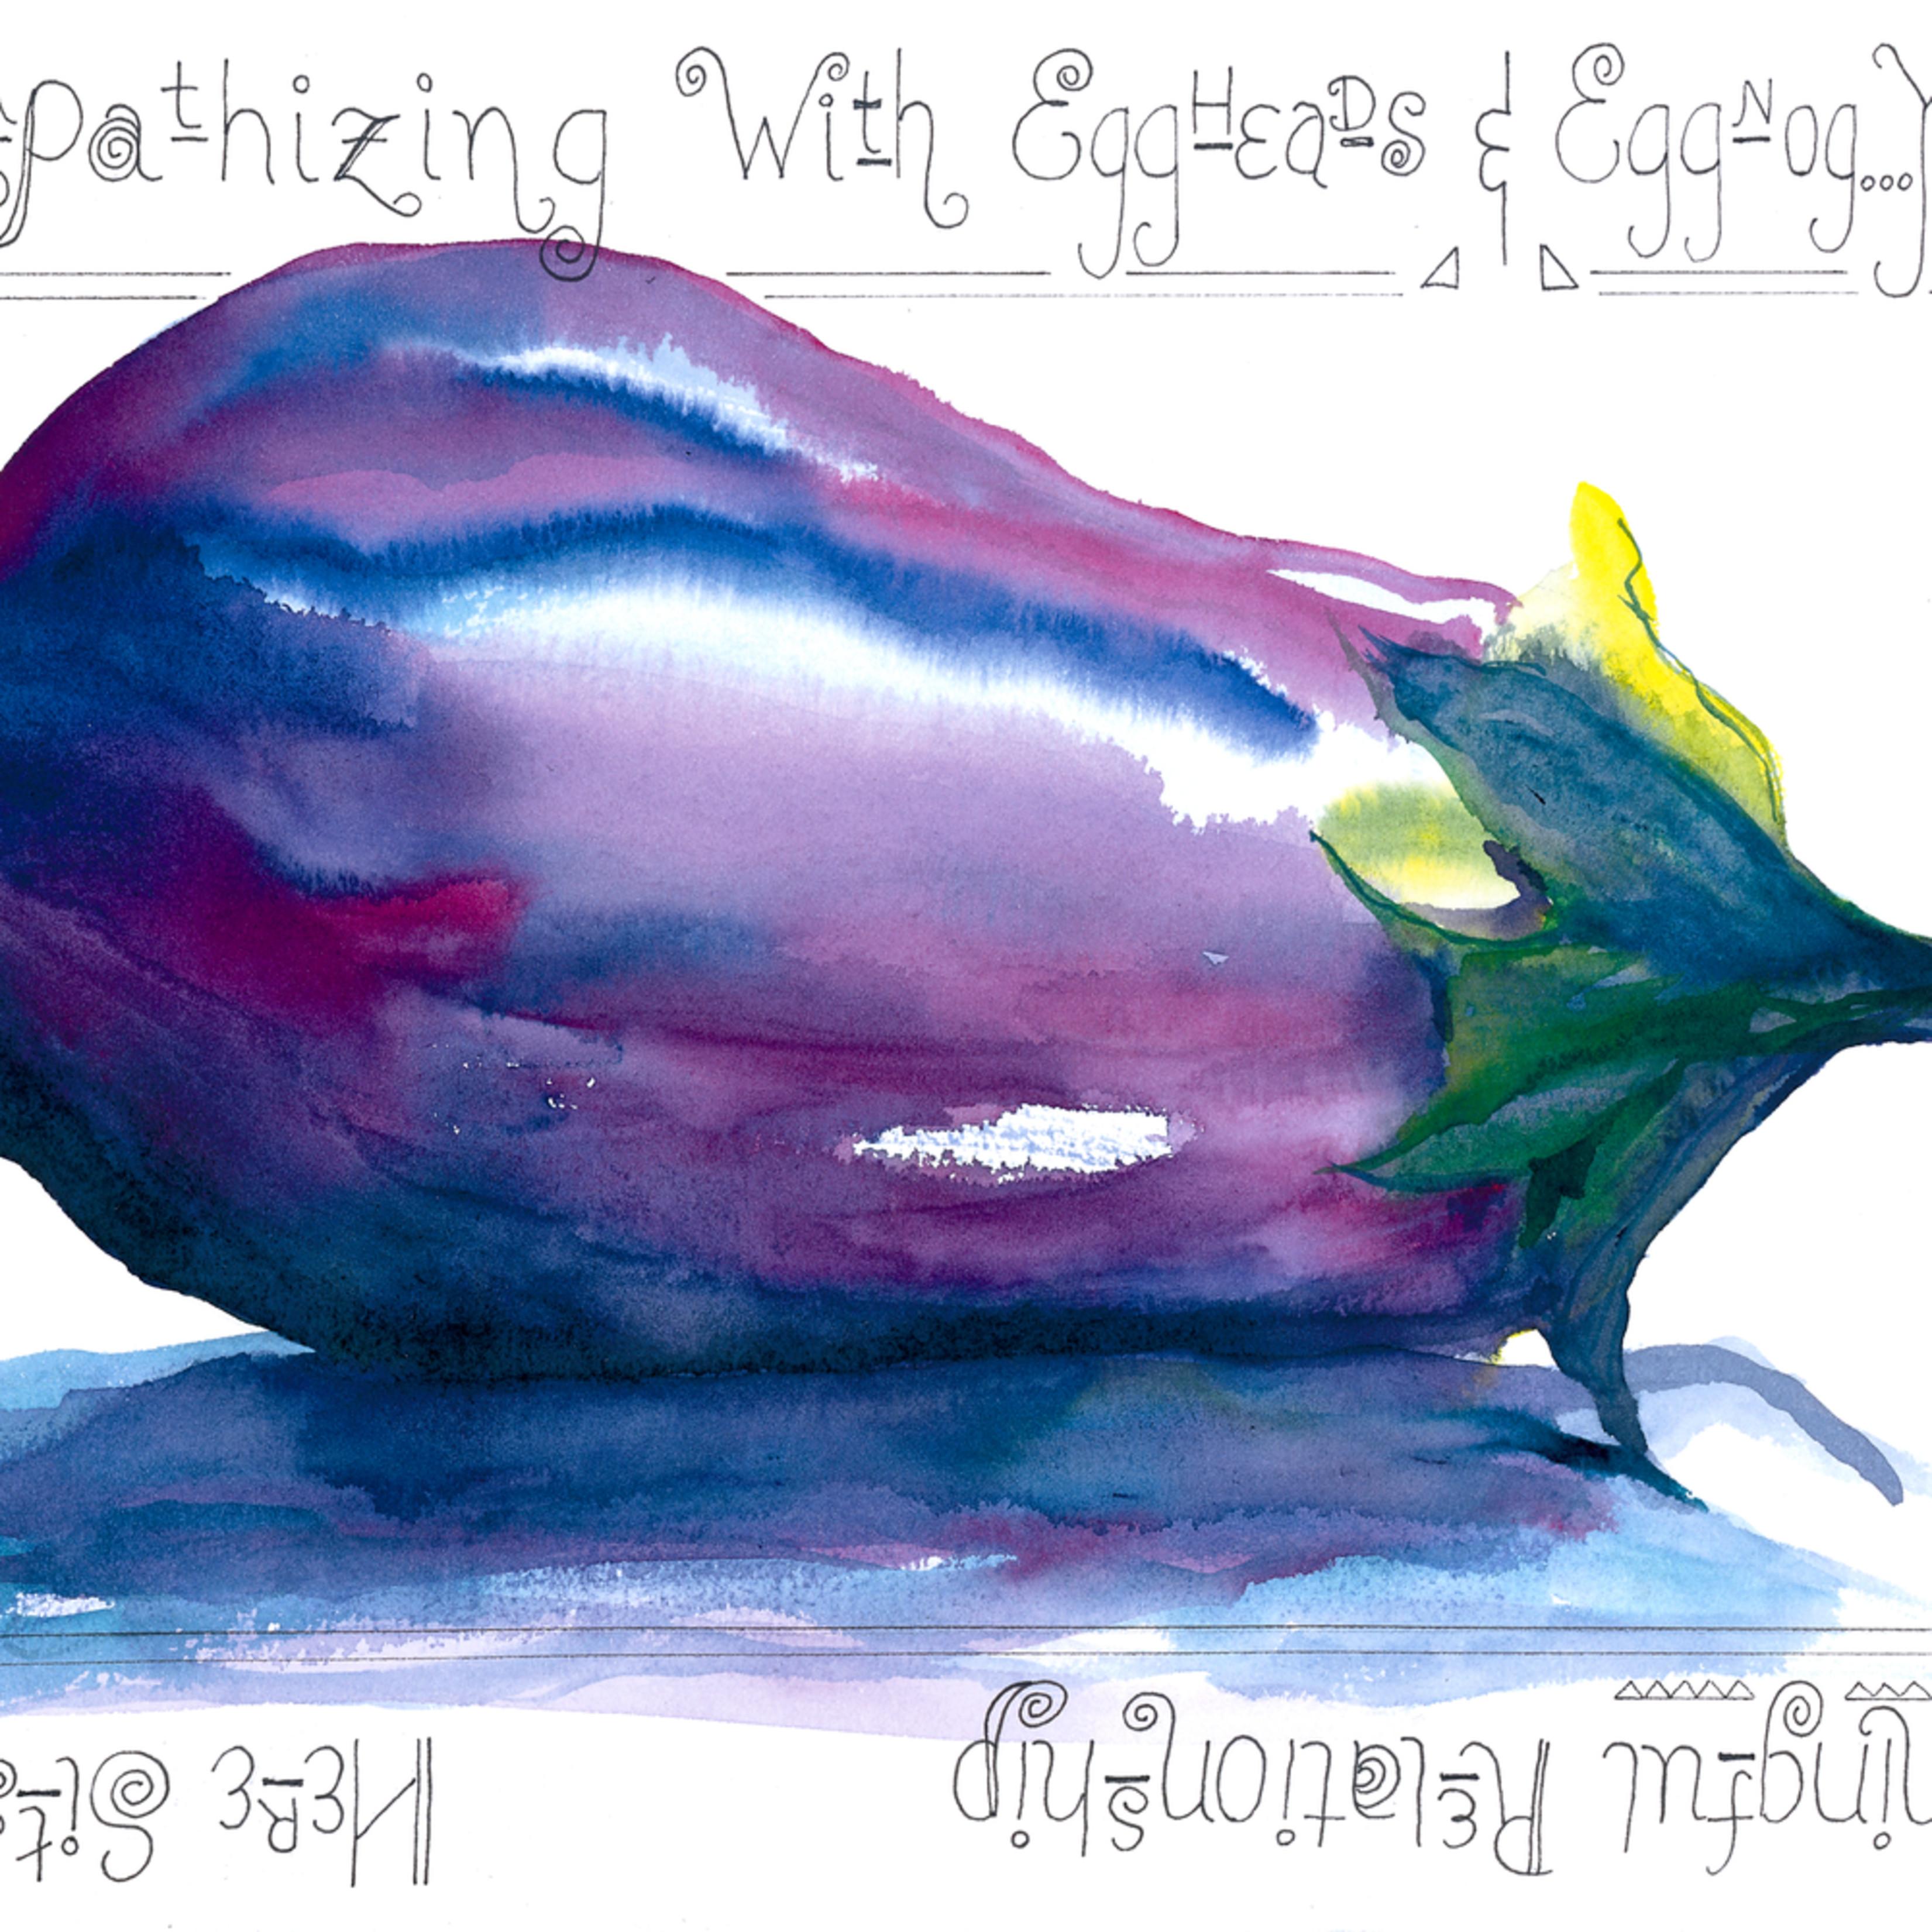 Eccentric eggplant jmmason lmmevt